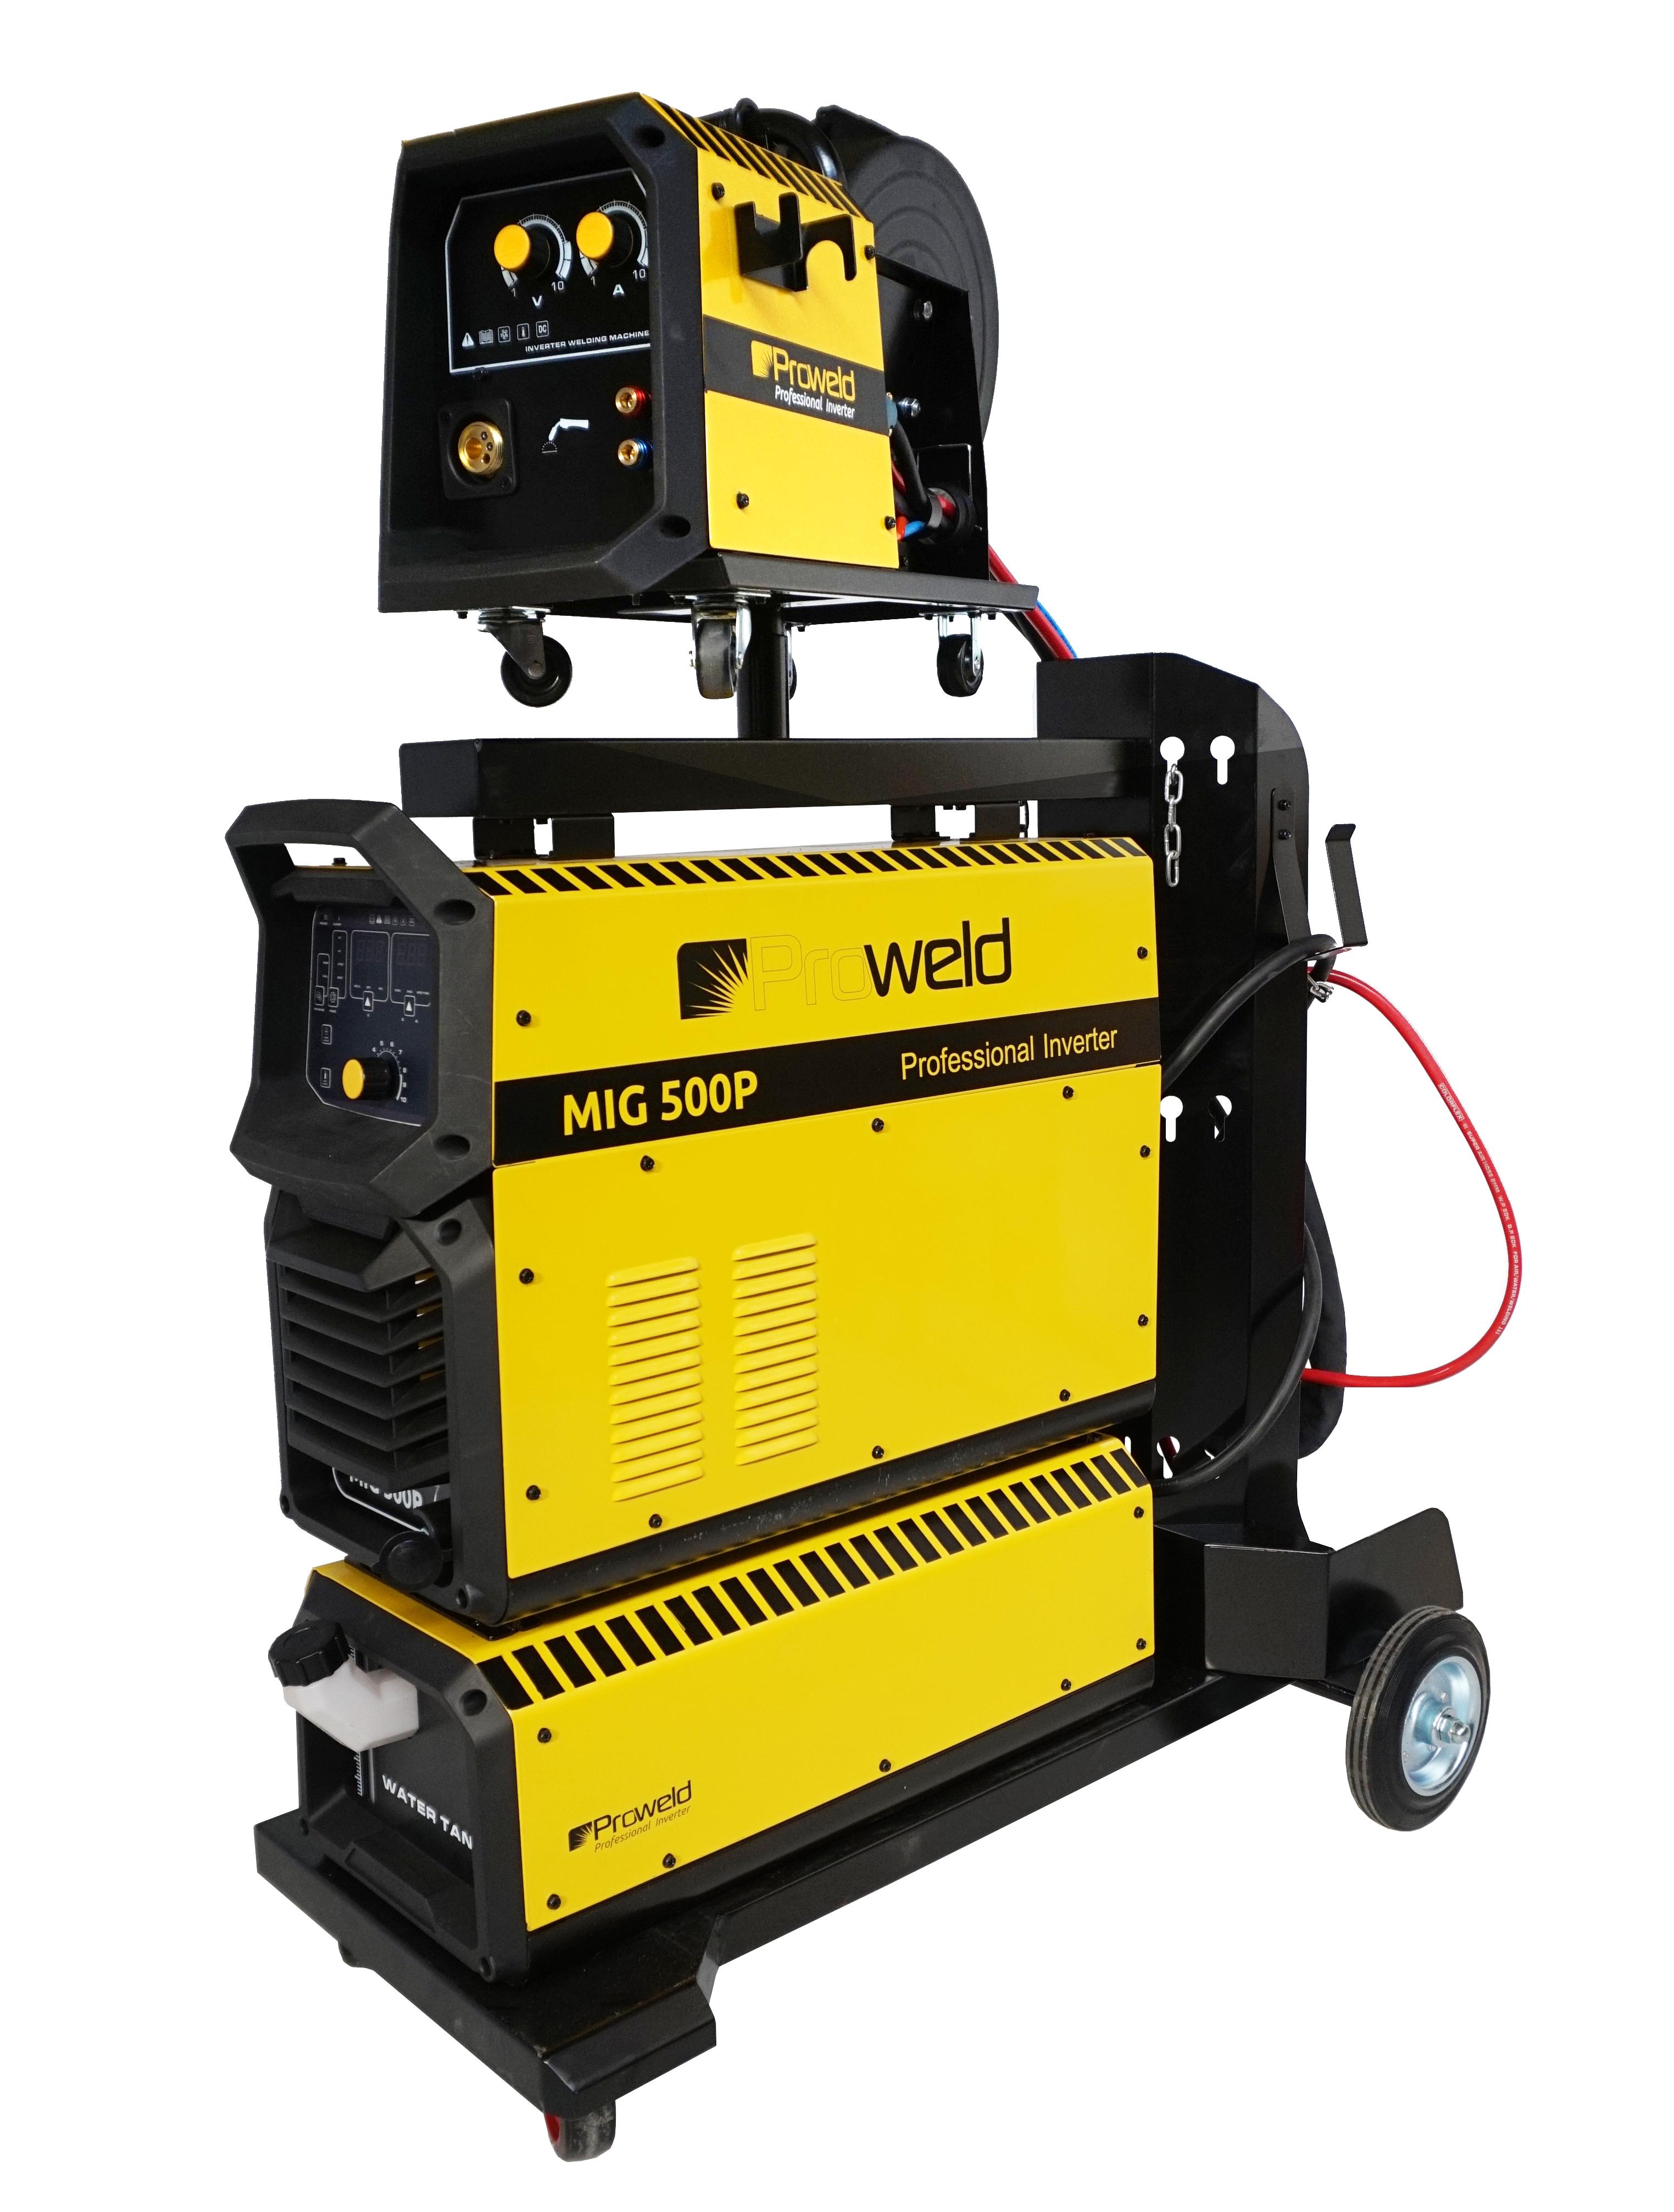 ProWELD MIG 500P invertor sudare MIG/MAG profesional, racire cu lichid, derulator detasabil, sudura aluminiu 0